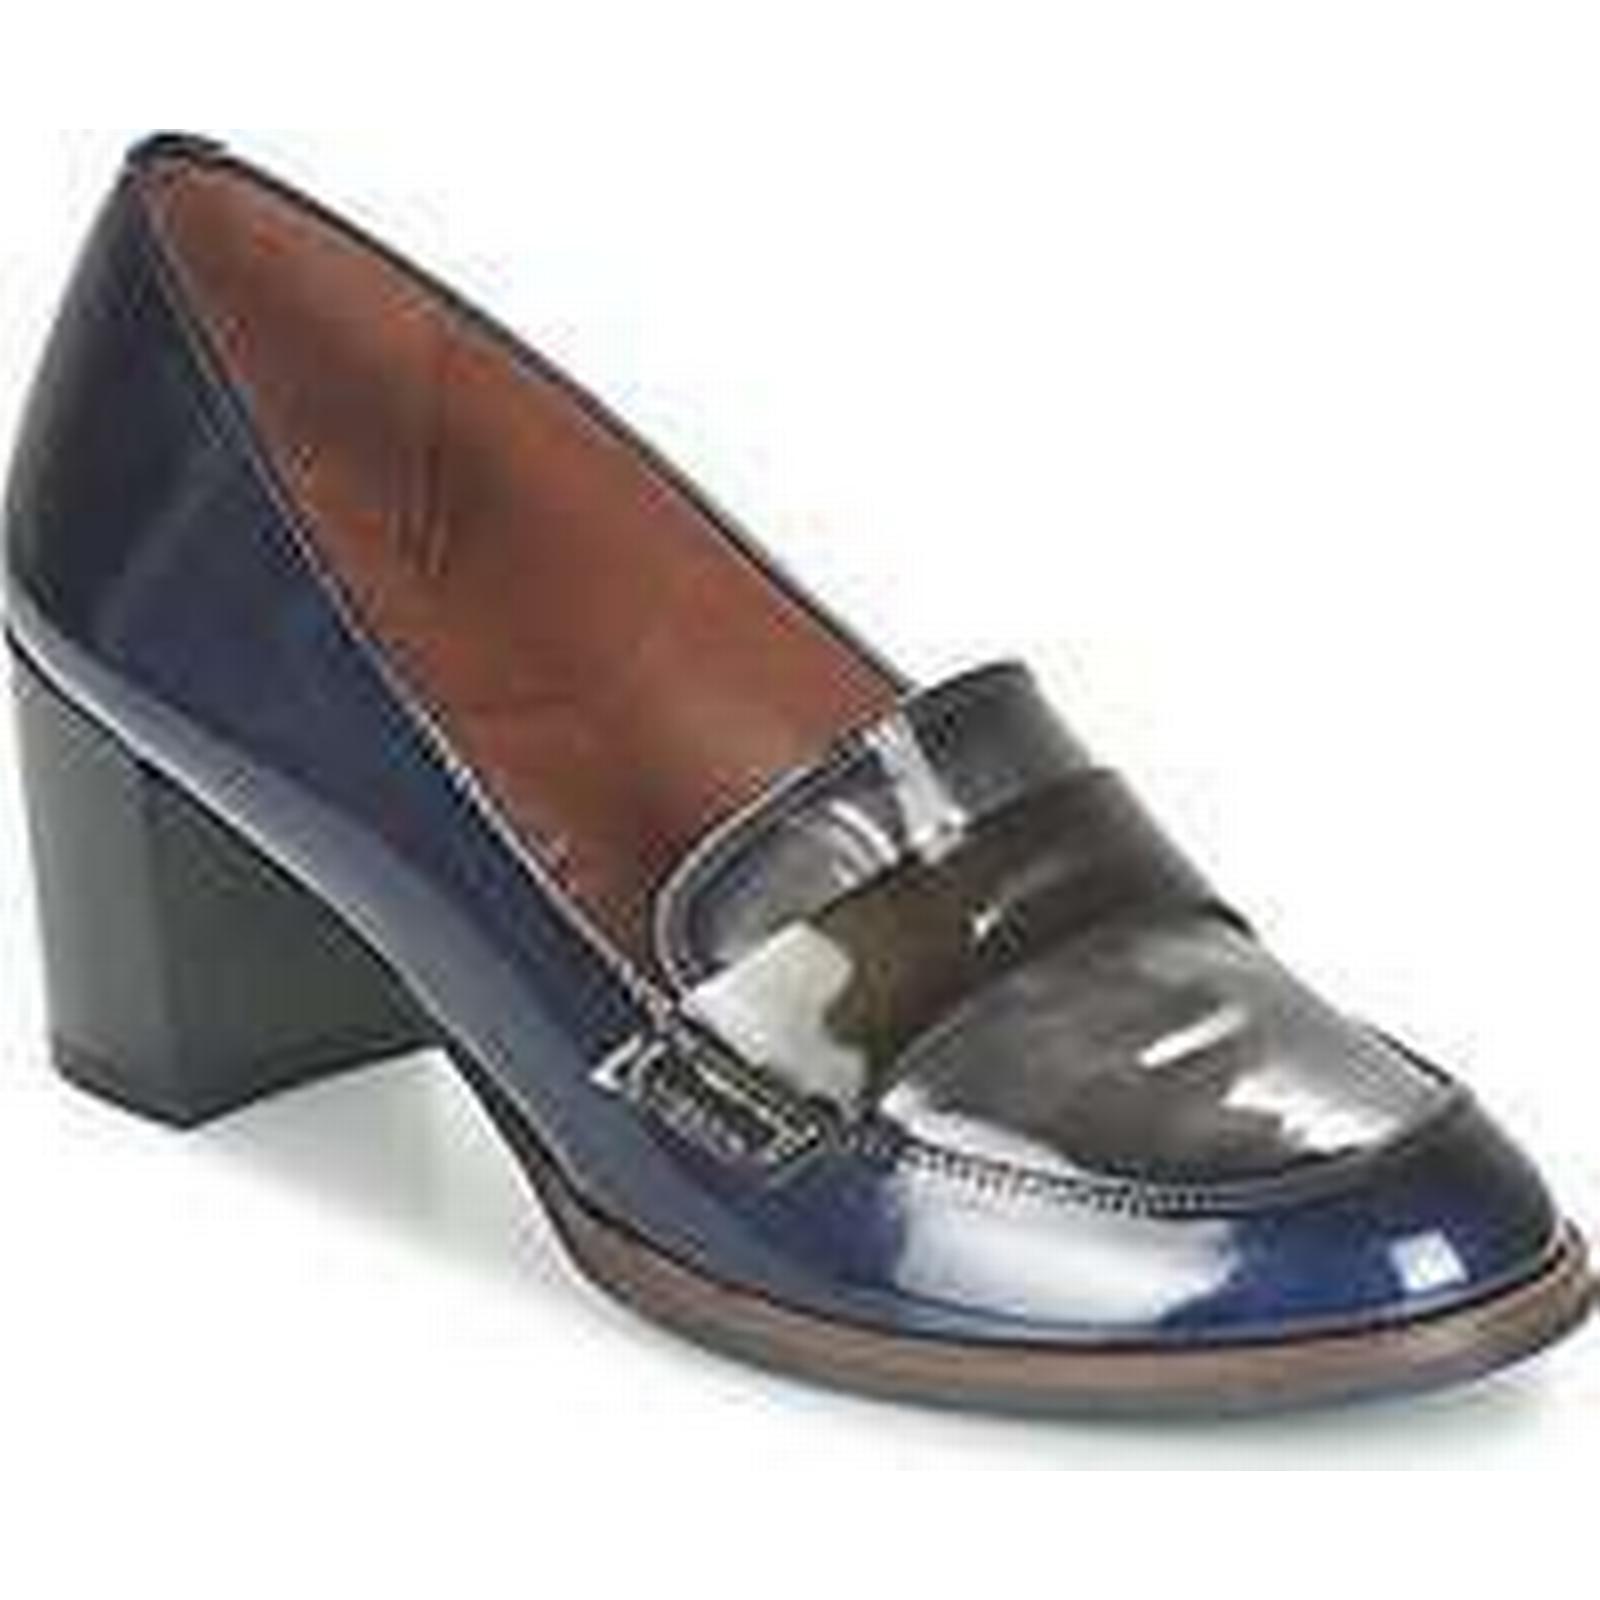 Spartoo.co.uk Hispanitas BRUJAS Blue women's Court Shoes in Blue BRUJAS 1956b9